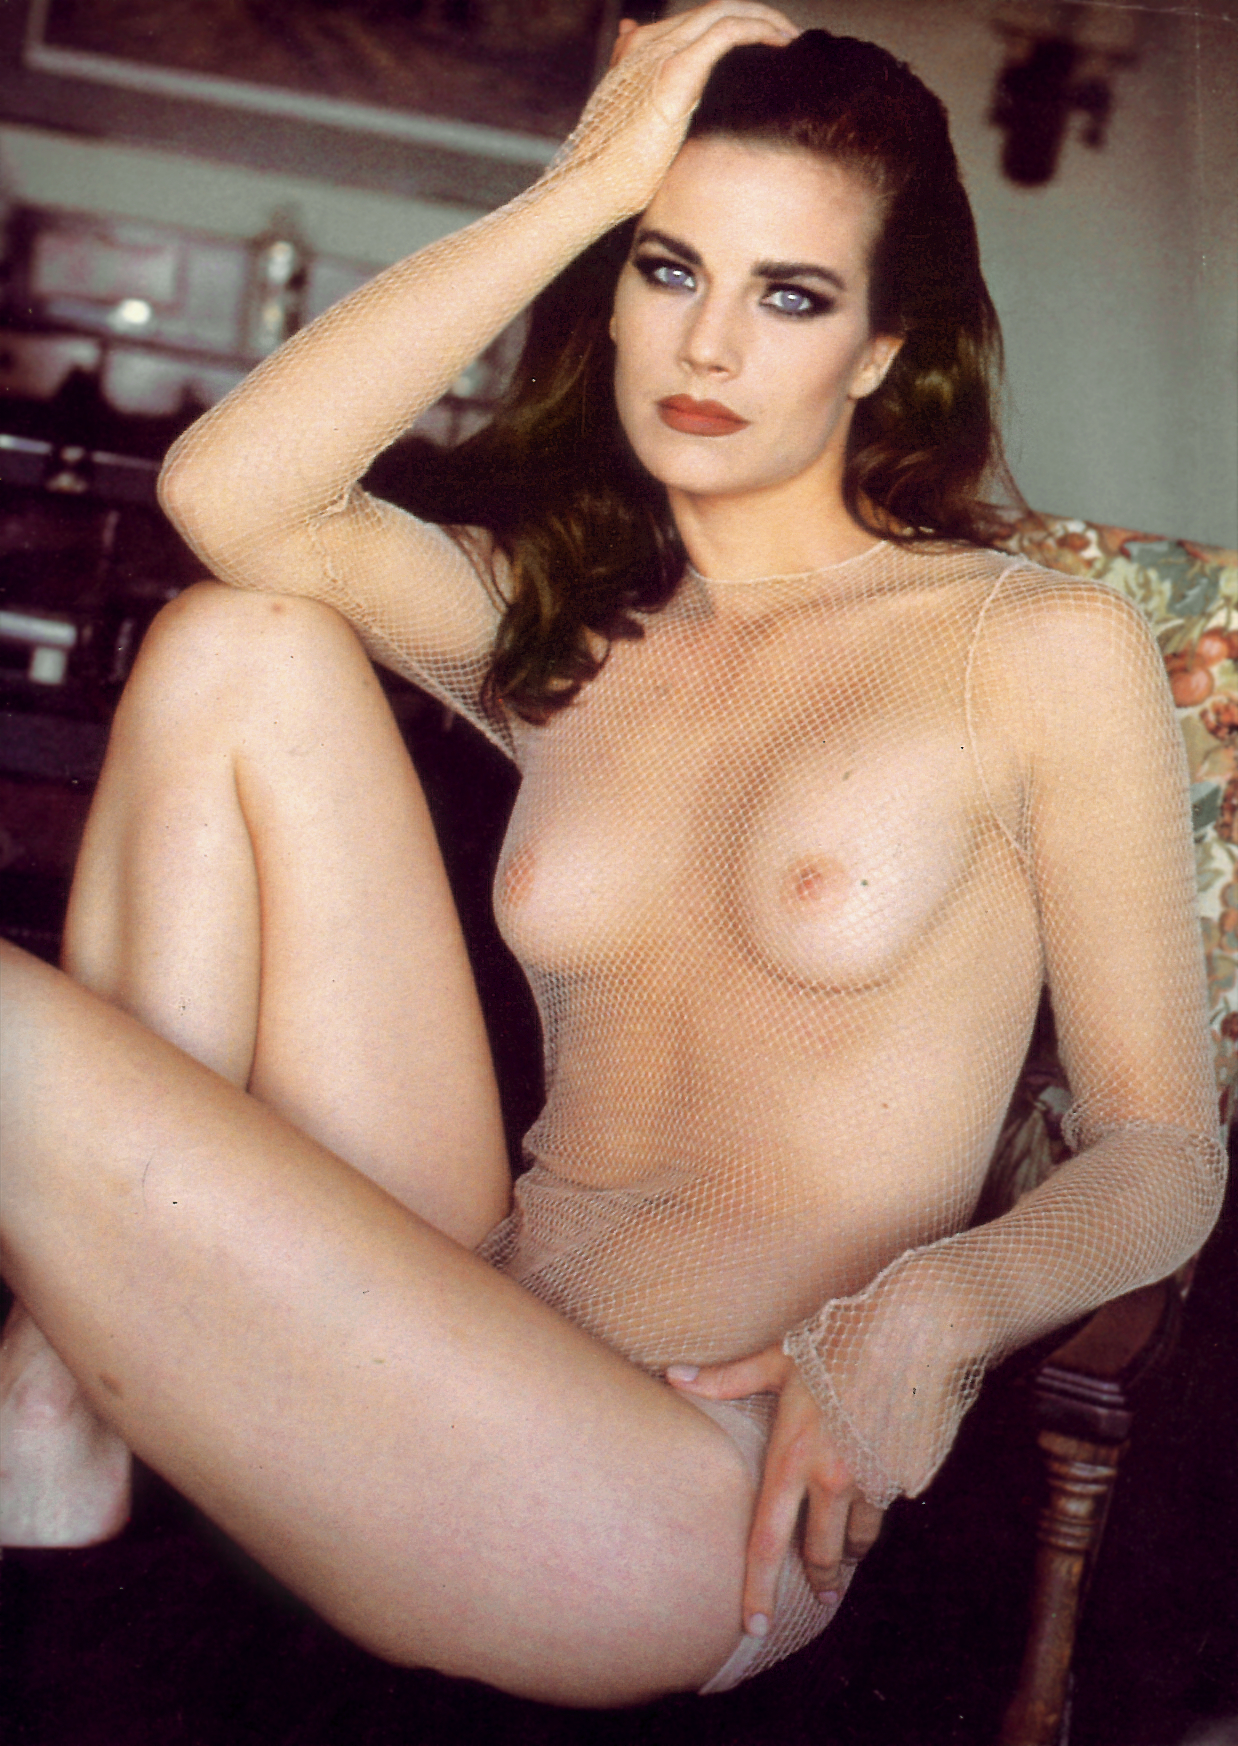 Farrell Nude Terry Farrell Naked Nude Terry Farrell Star